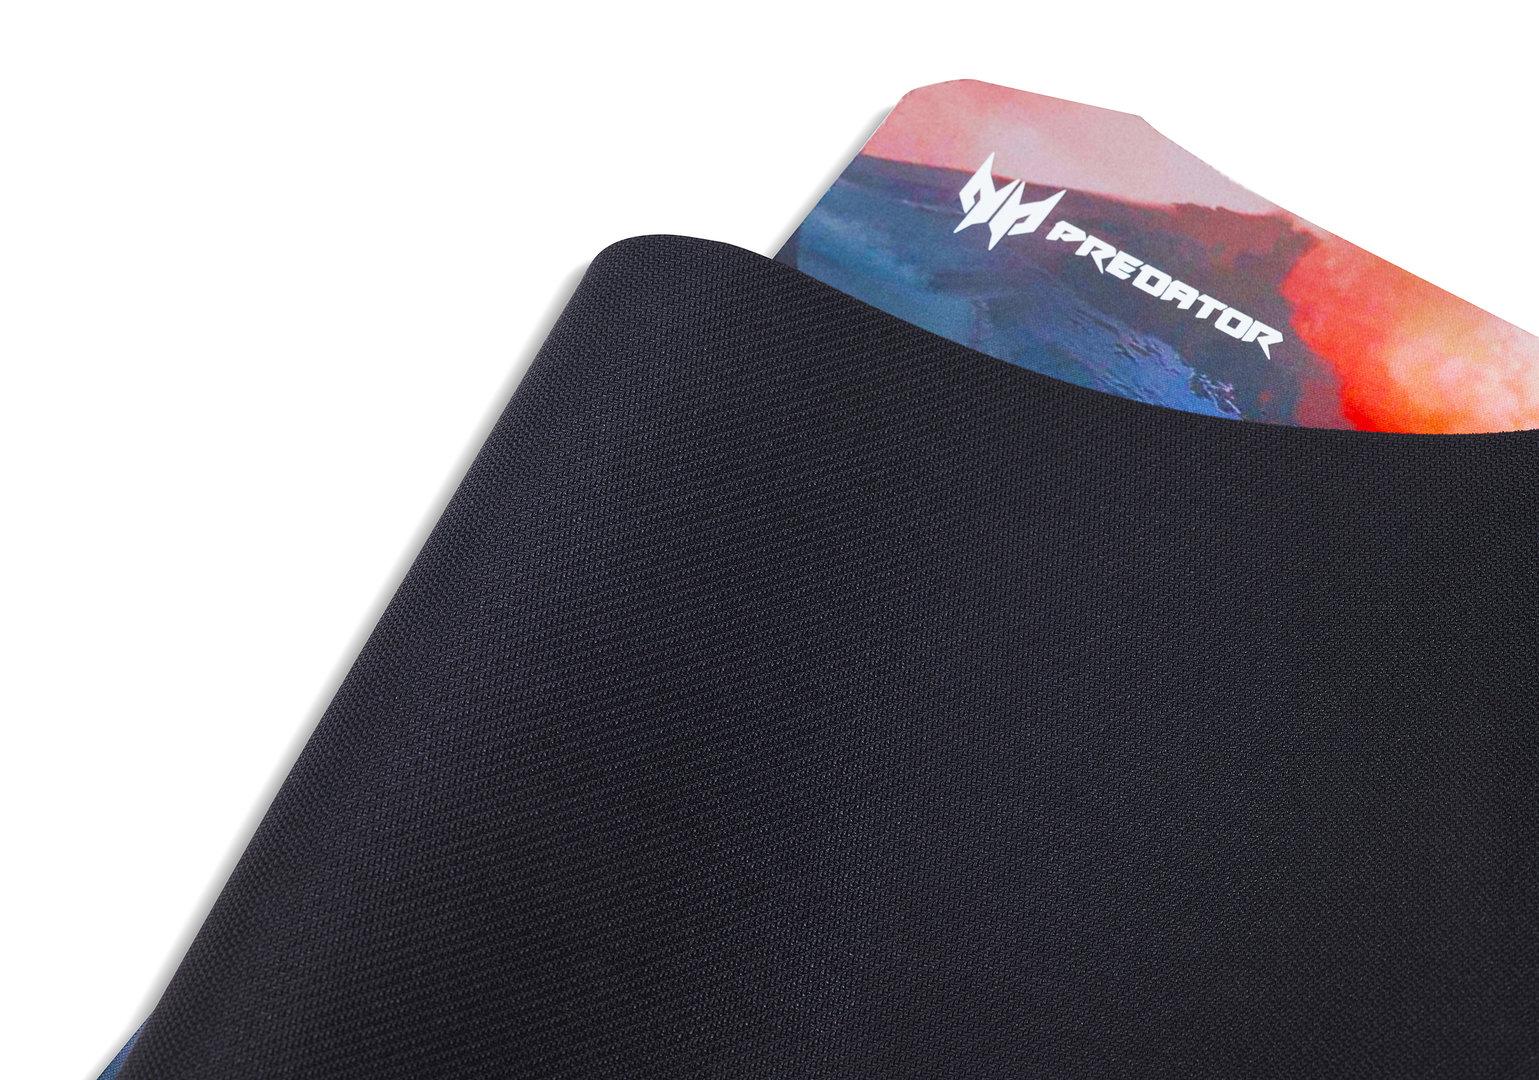 Acer Predator Mousepad